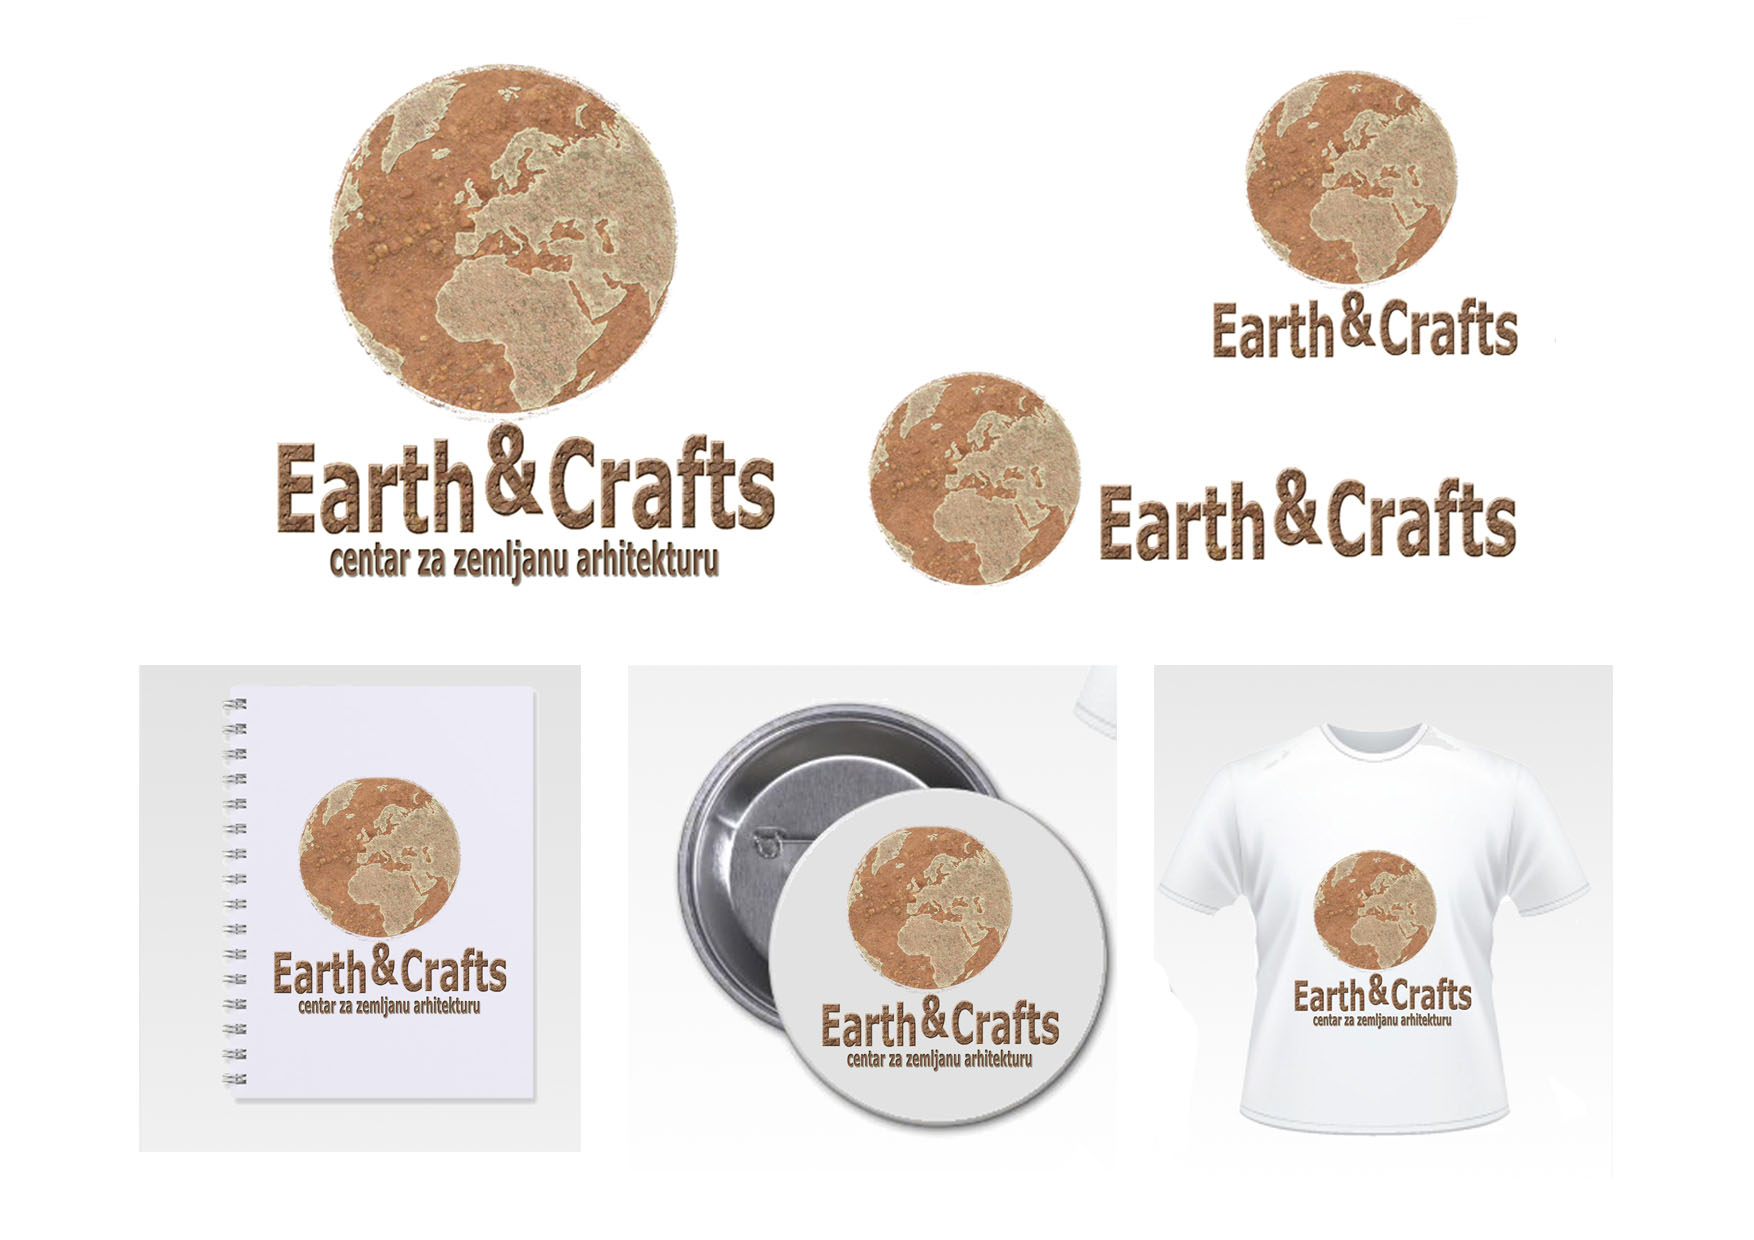 02 predlog logo EARTH&CRAFTS Aleksandra Tosman aleksandra.tosman@gmail.com